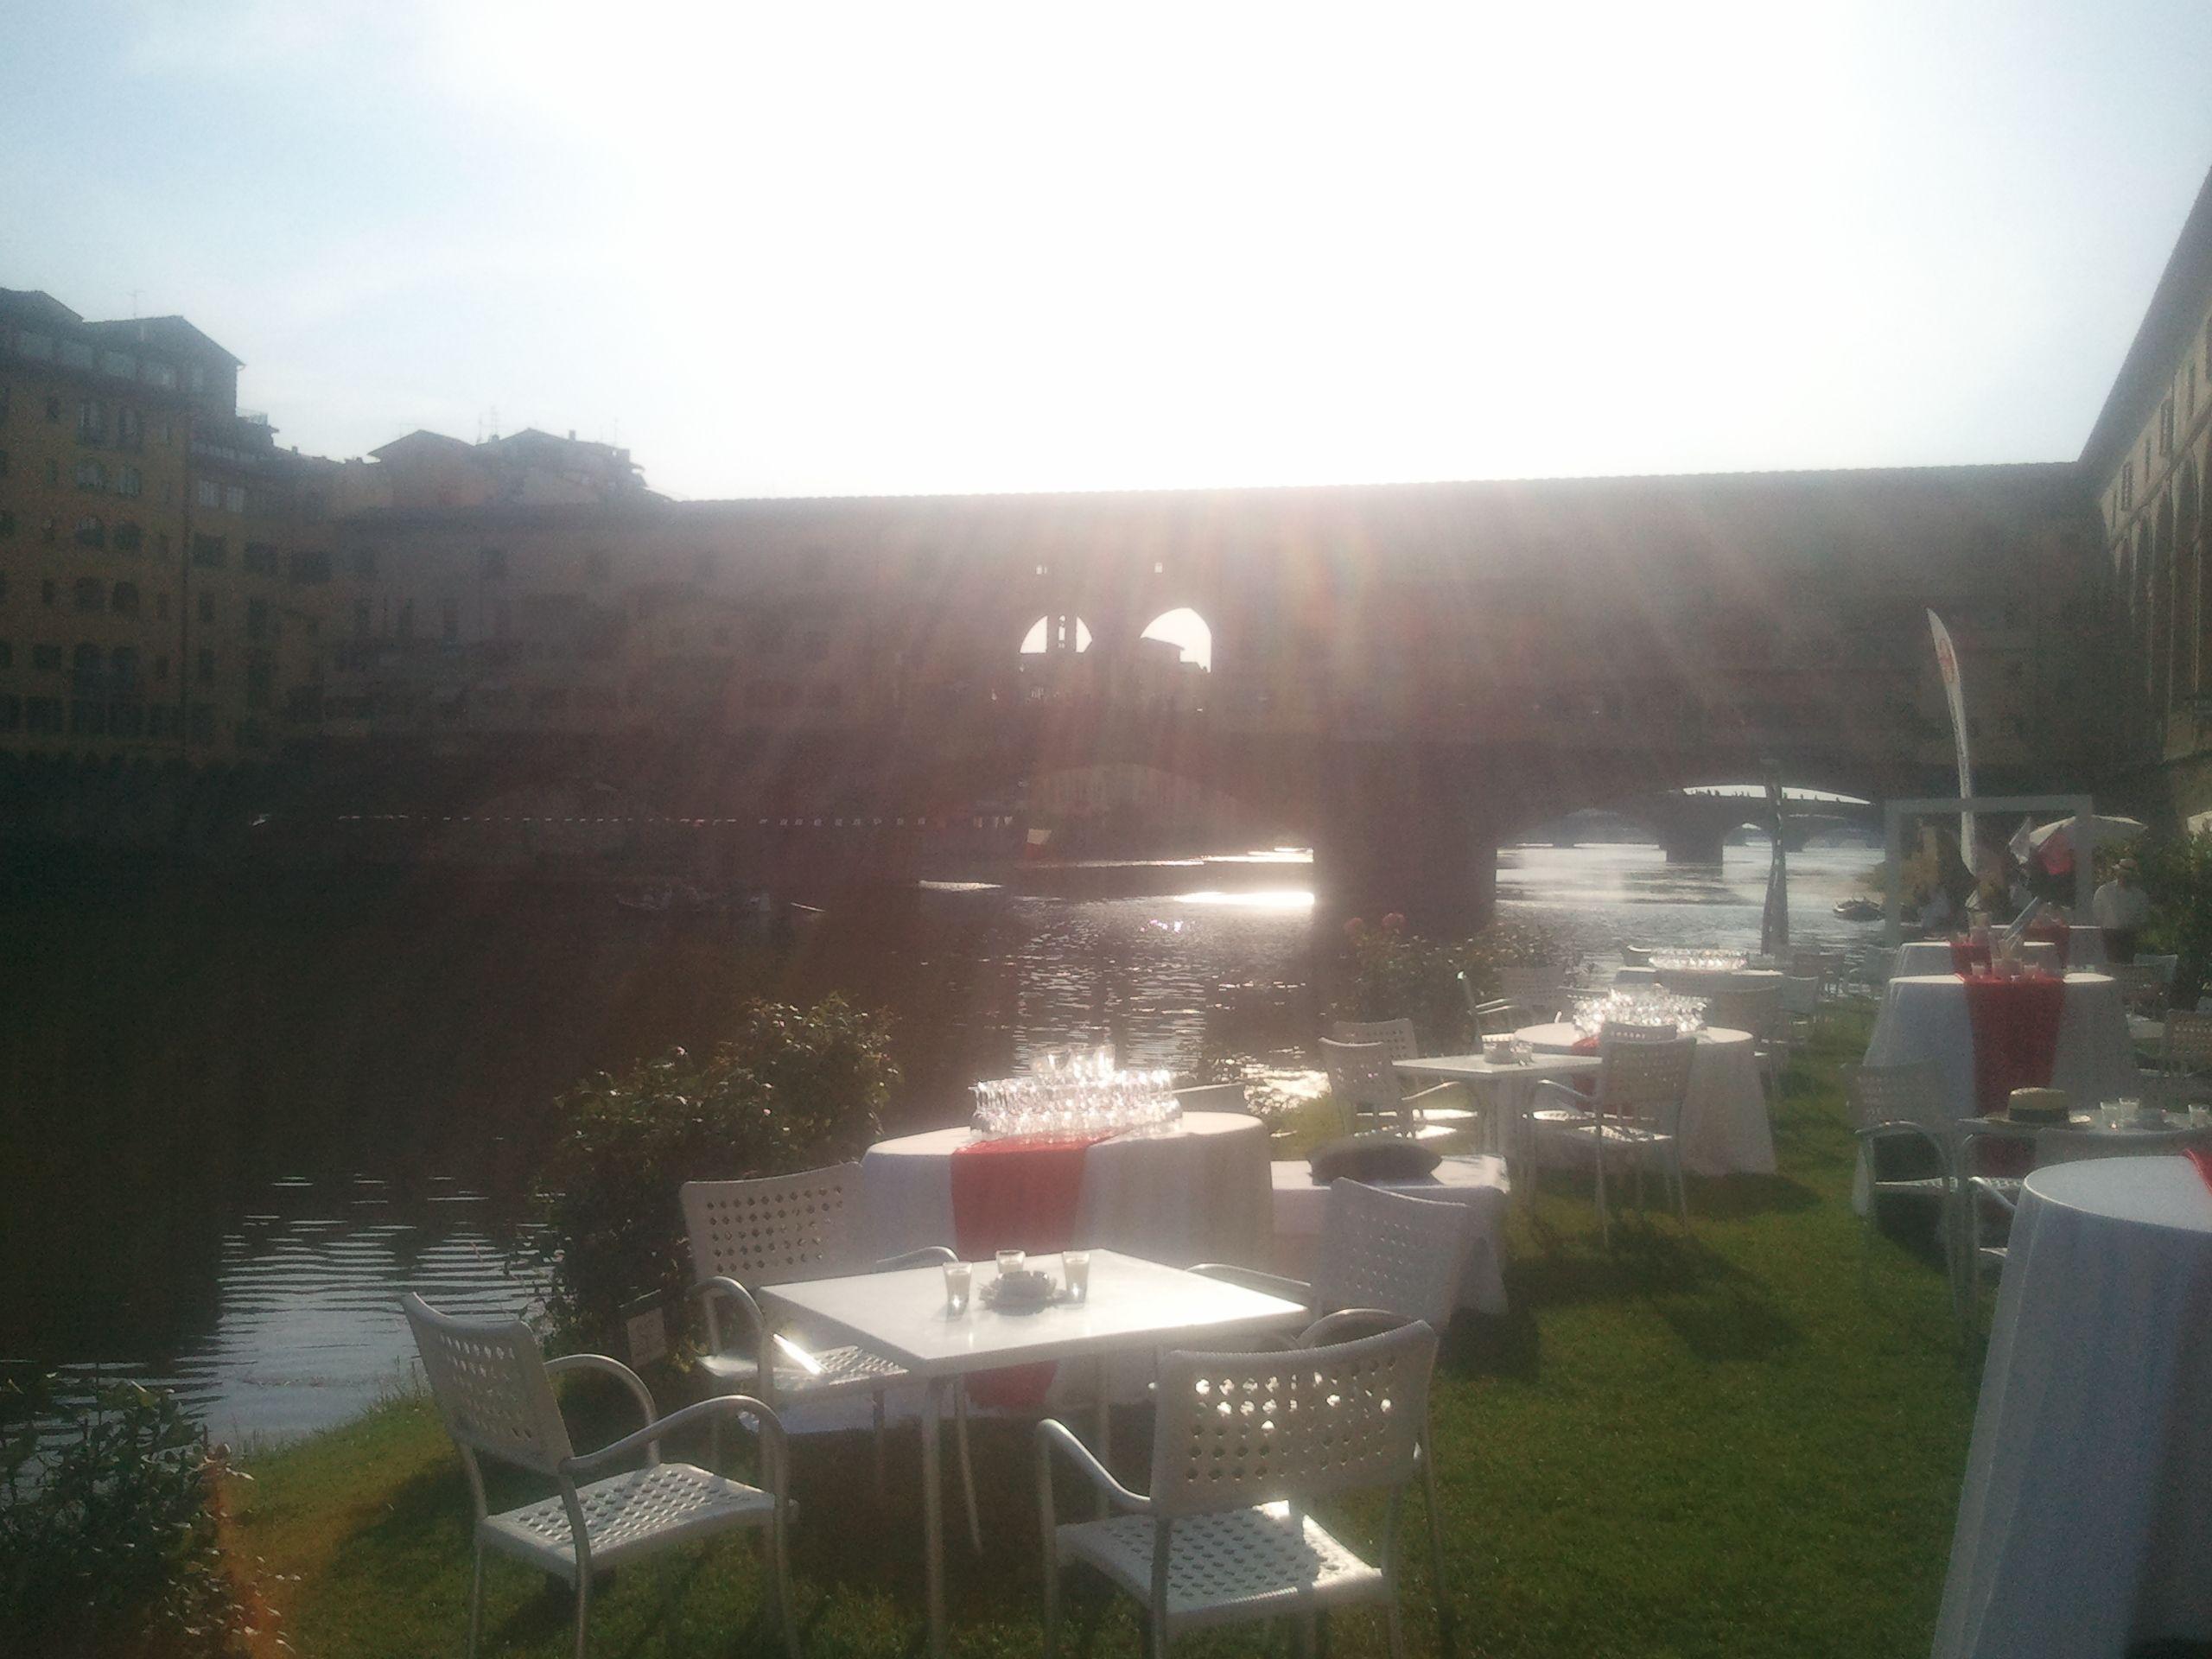 Società #Canottieri #Firenze, 19 Giugno 2012: The Race #jaguartherace #florence #arno #rowing #pontevecchio #conteofflorence #summer #sun #italy #tuscany